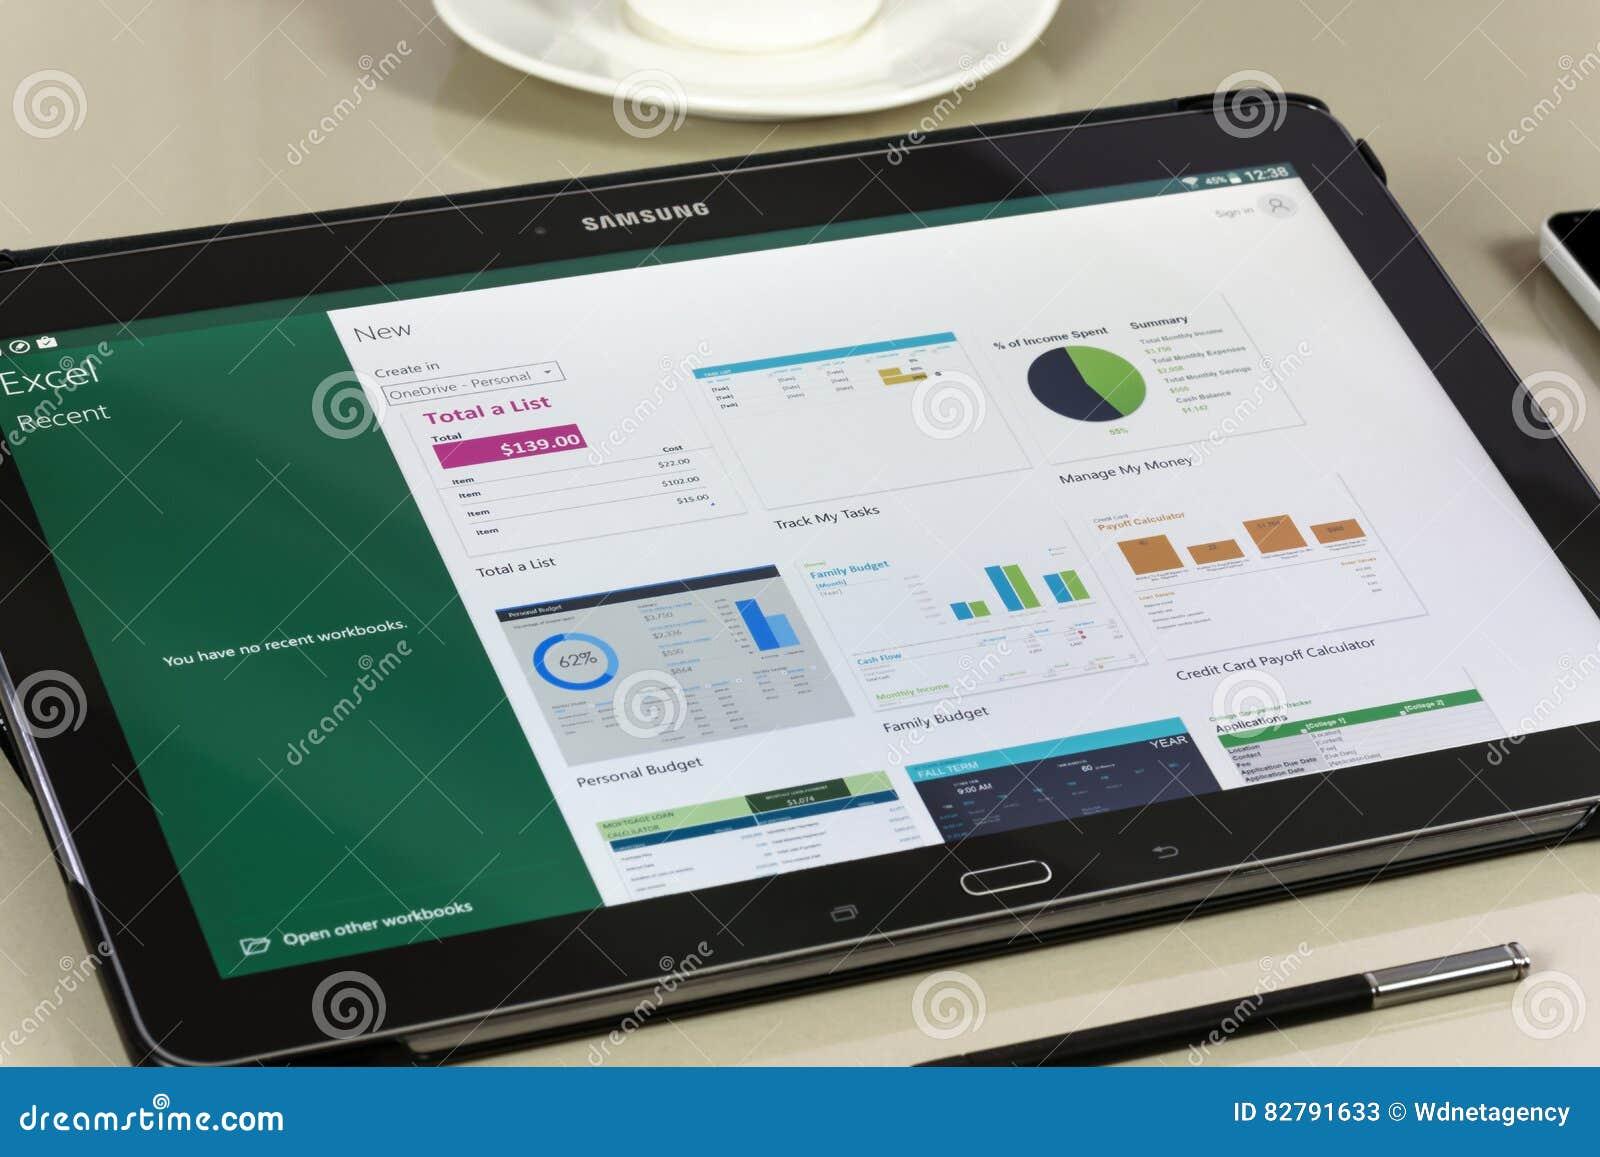 Microsoft Office Excel app on Samsung tablet